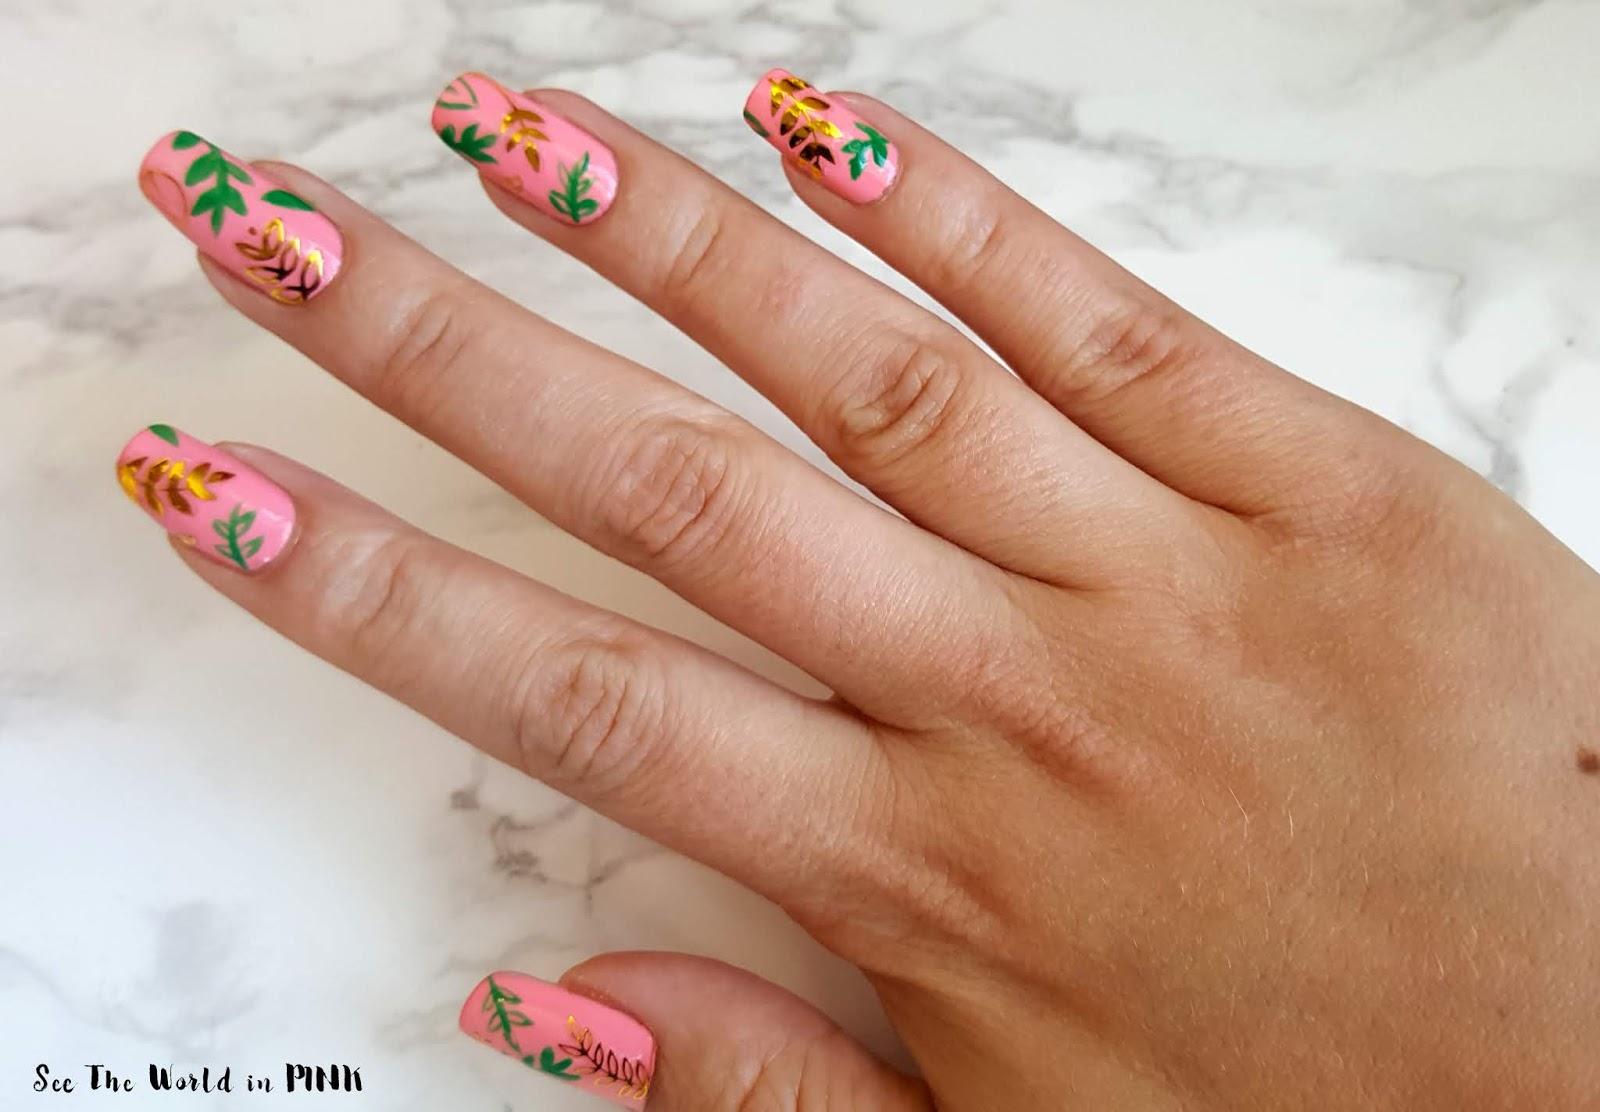 Manicure Monday - Green and Gold Foliage Nails!